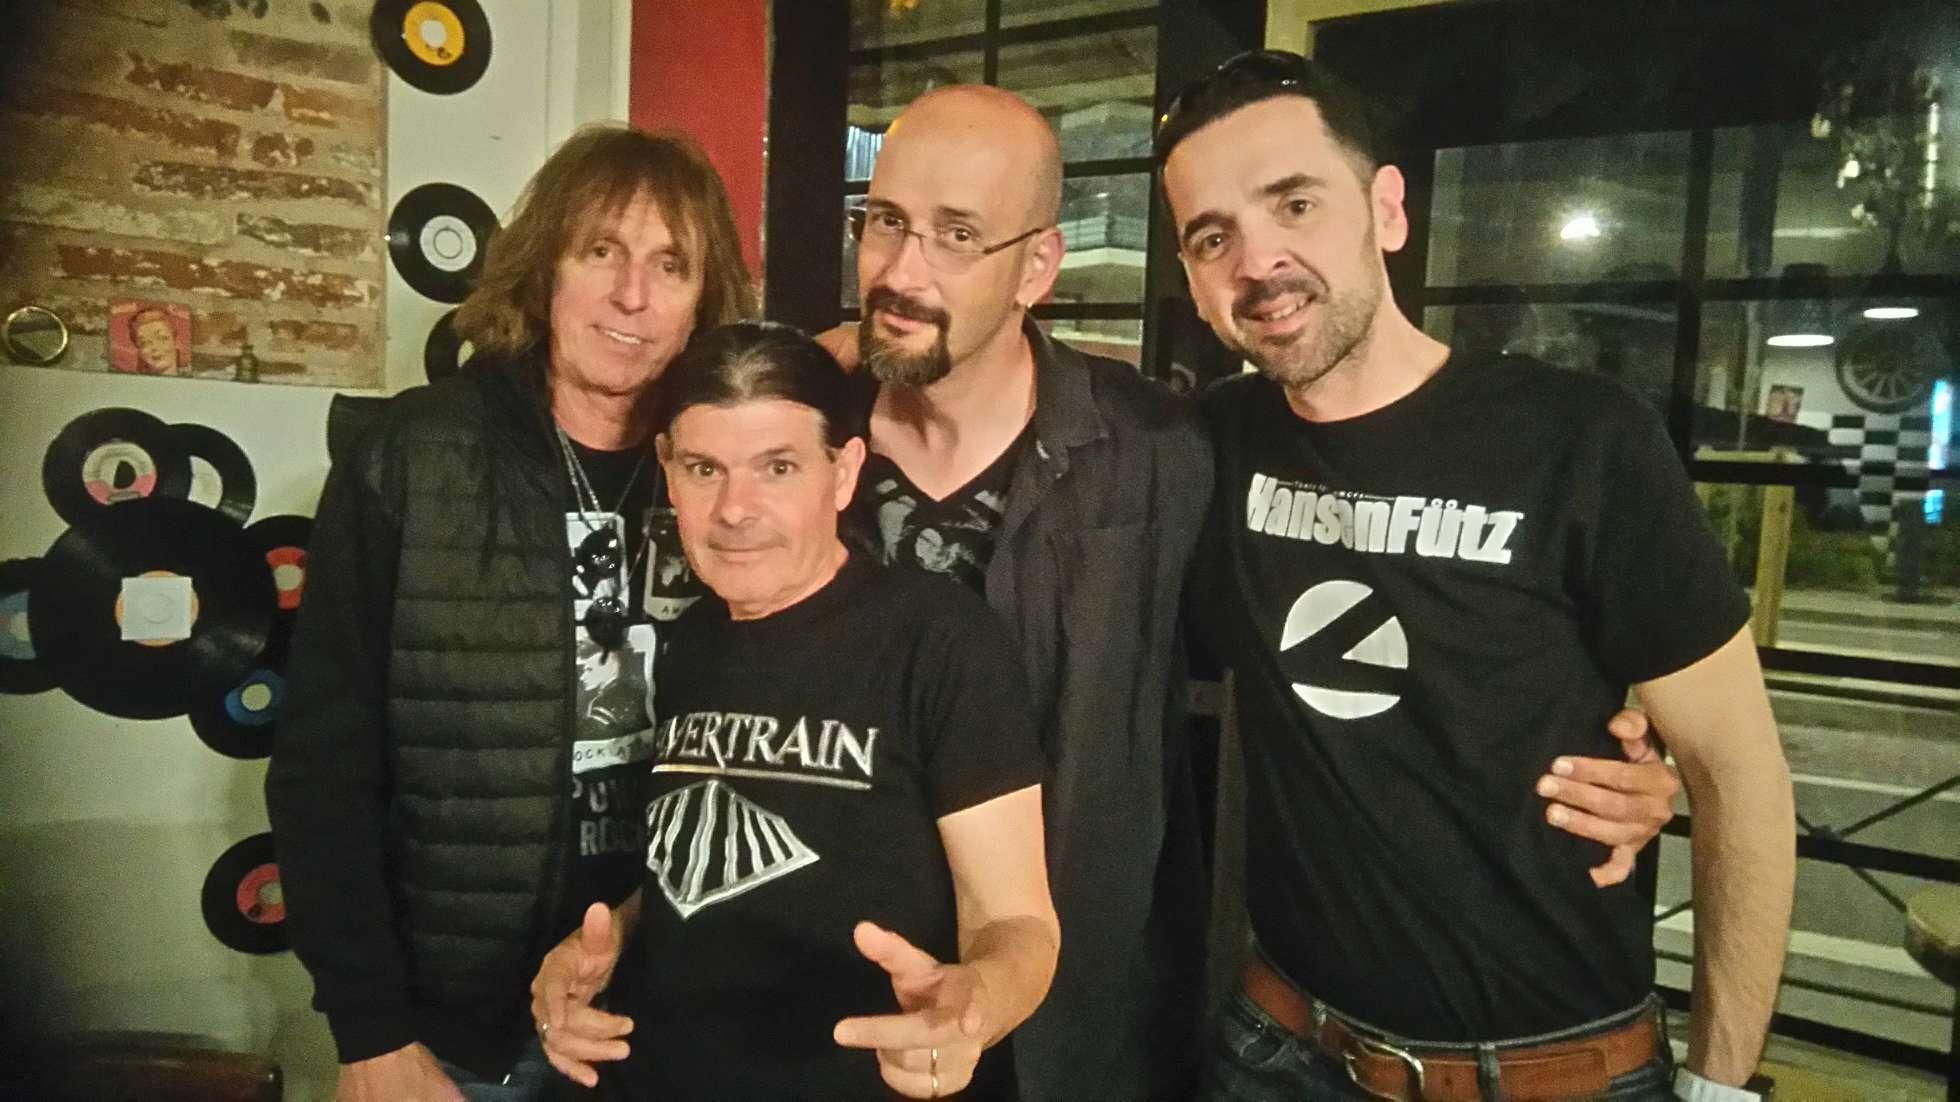 SILVERTRAIN No Illusion (2018) Heavy Metal Originaire de Strasbourg 30171210